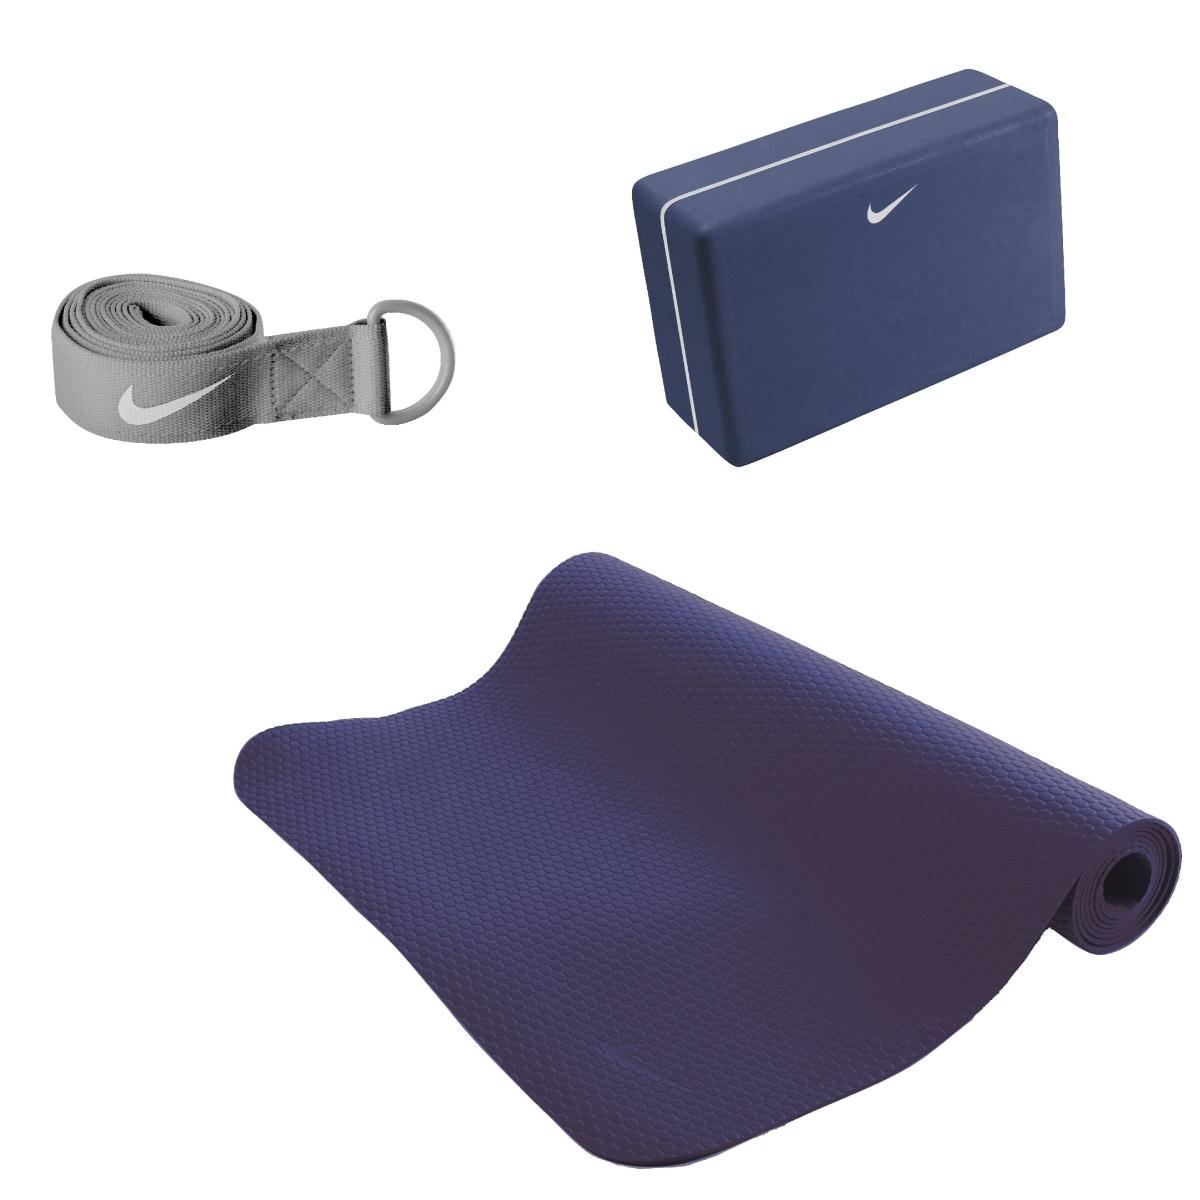 agenda cúbico horno  Nike Fitness Essential Yoga KIT 2017 dunkelblau online bestellen